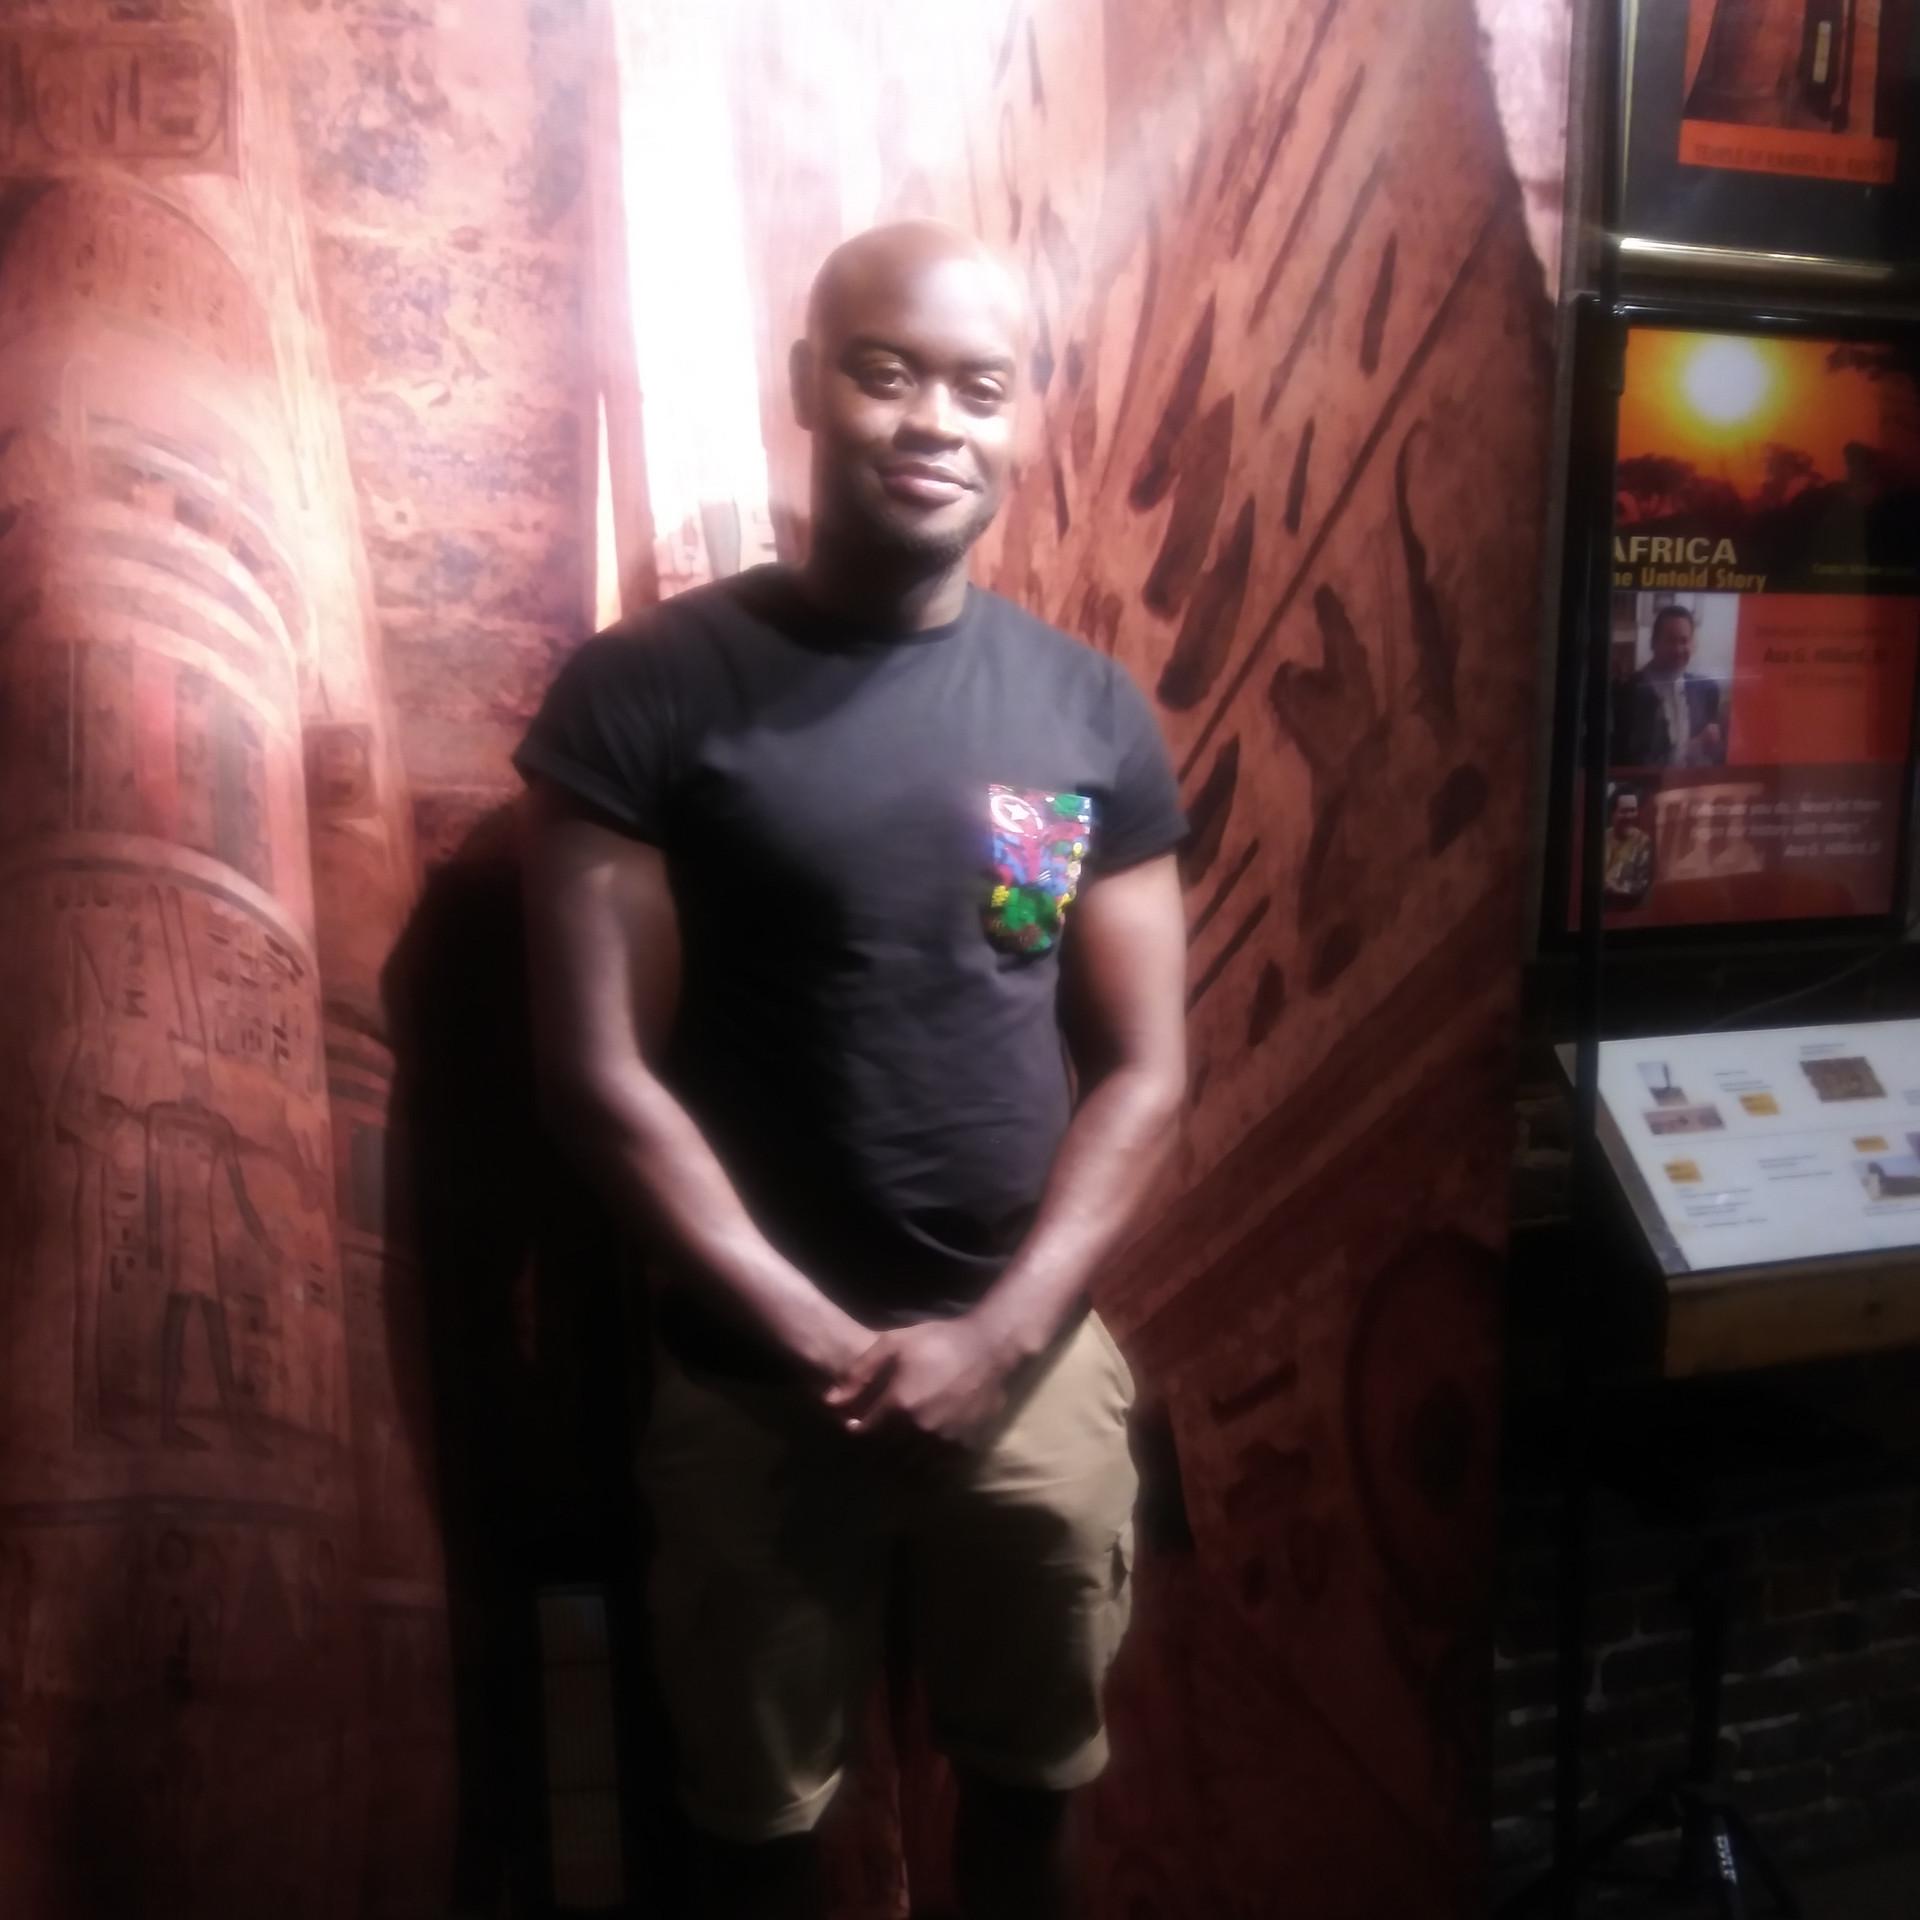 Visitor from London, England, Malelhi Abubaka